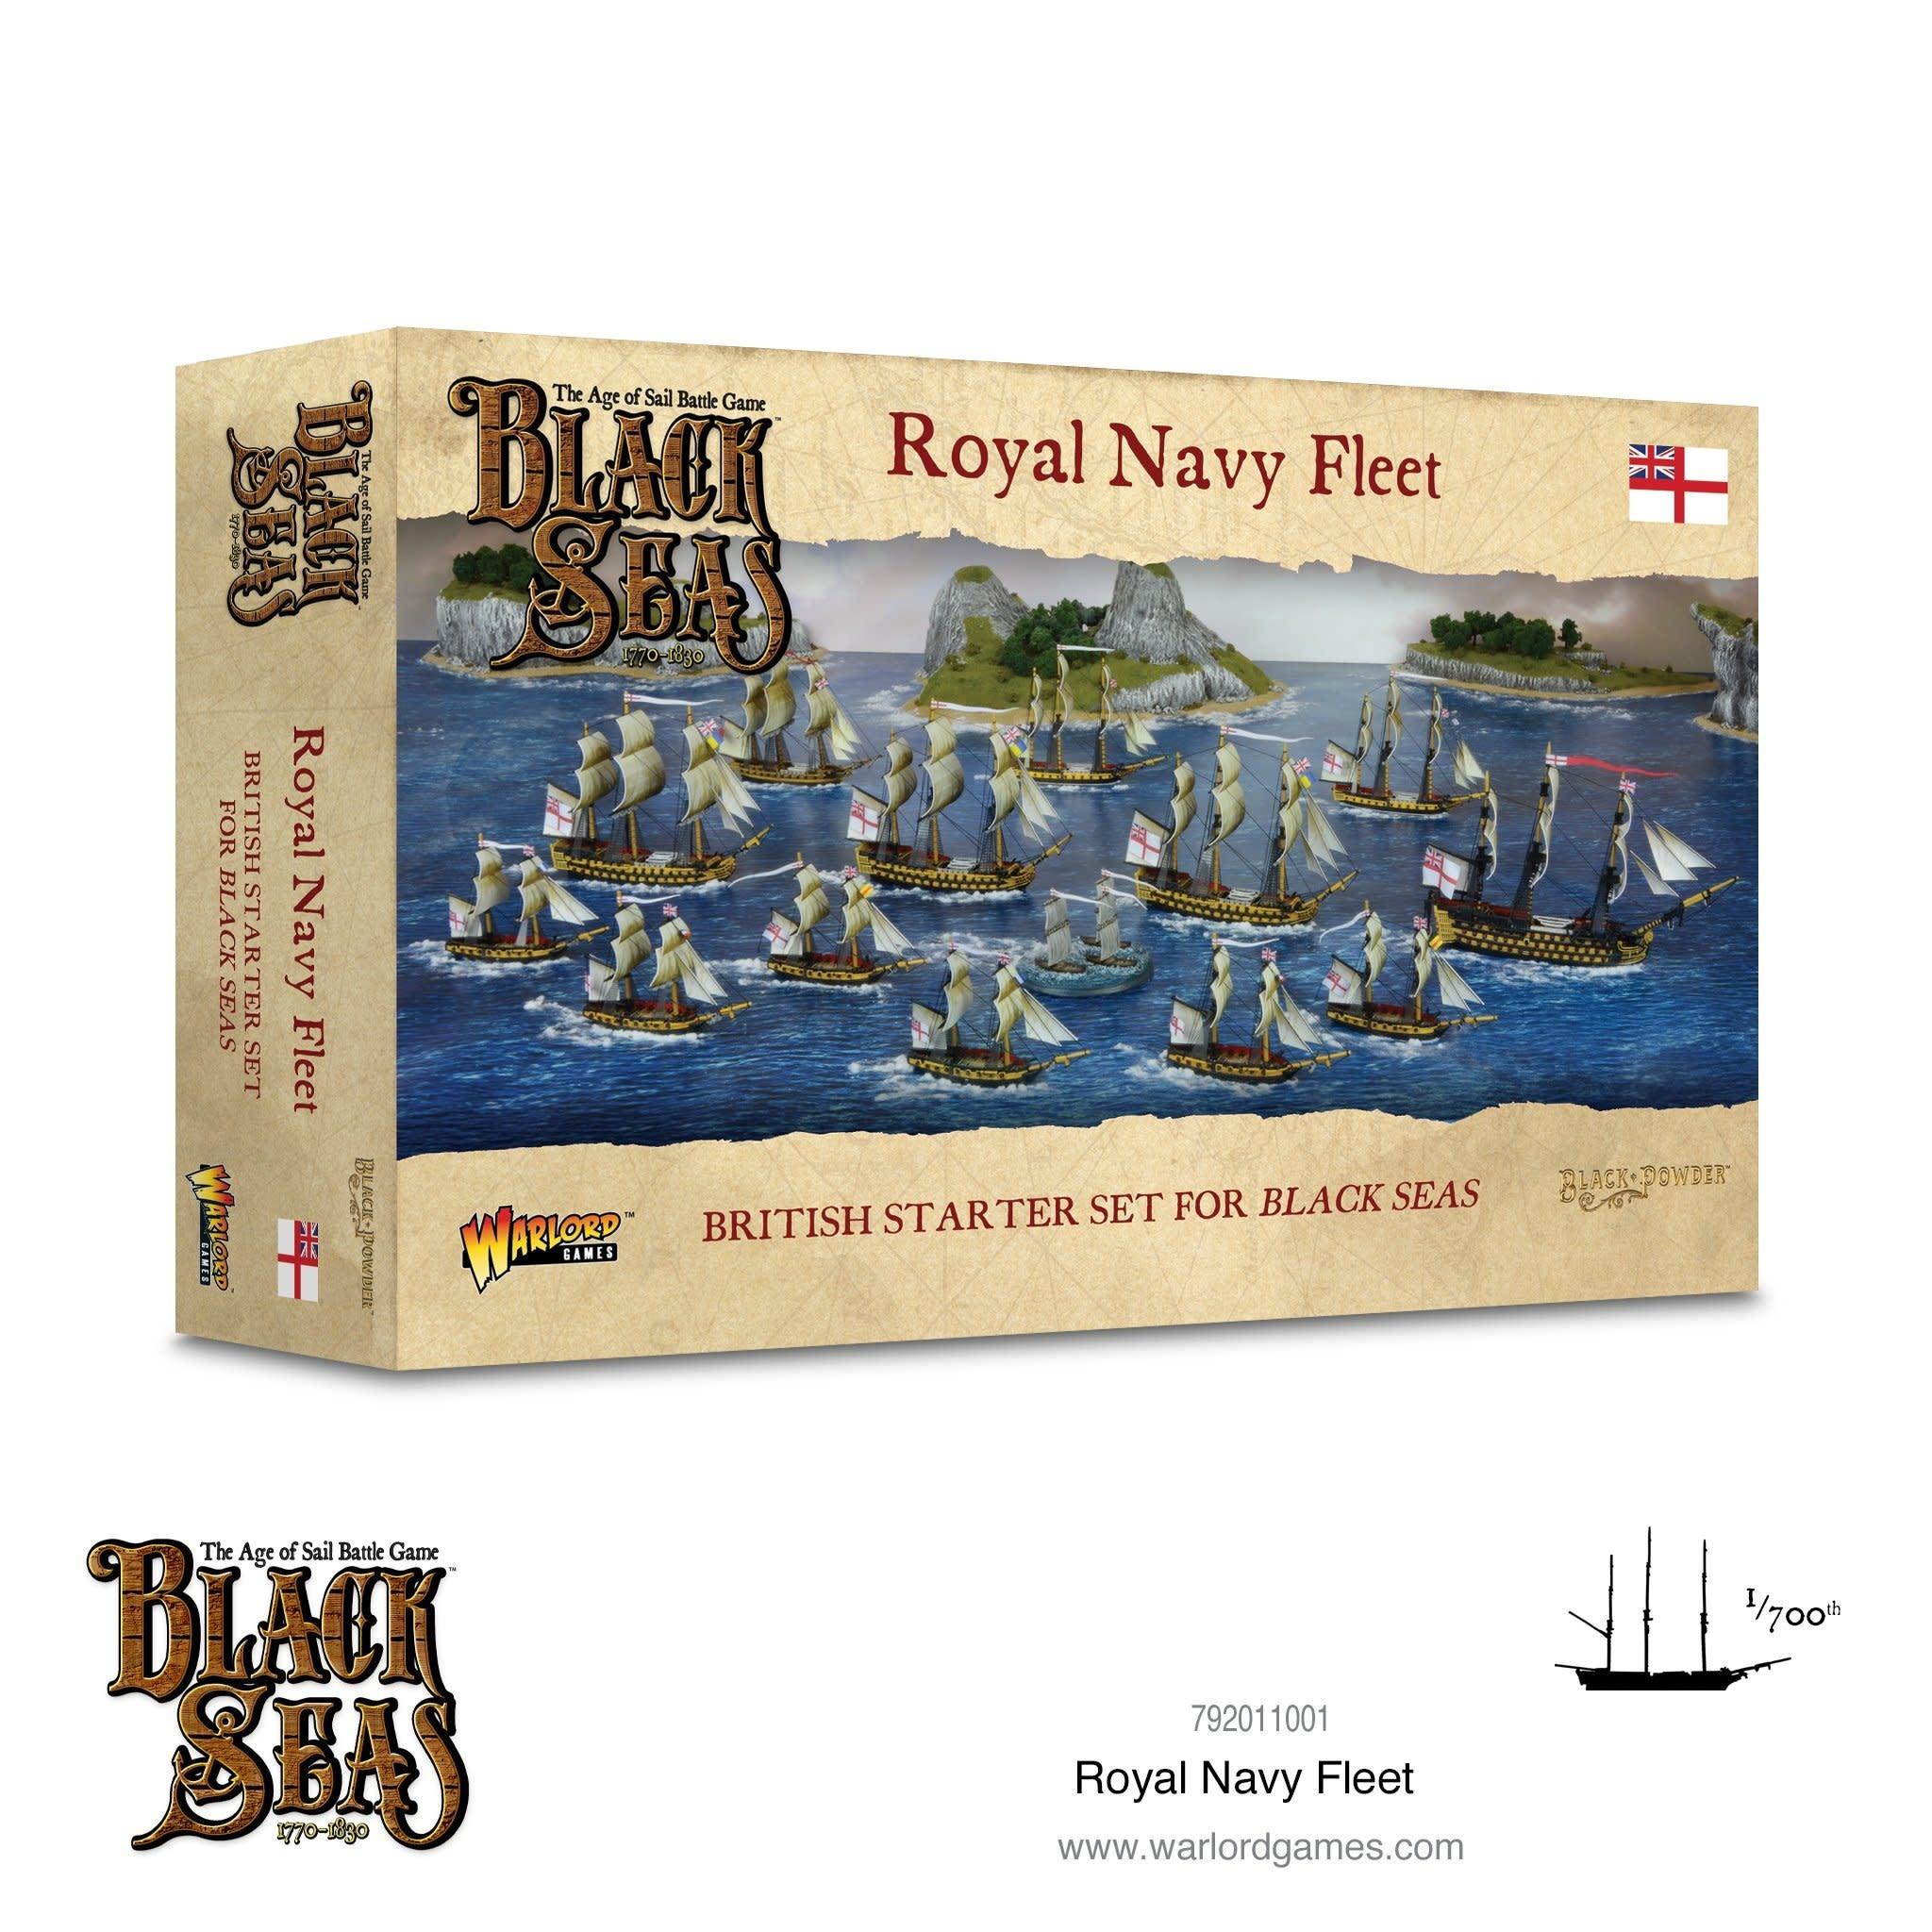 Warlord games Black Seas: Royal Navy Fleet box